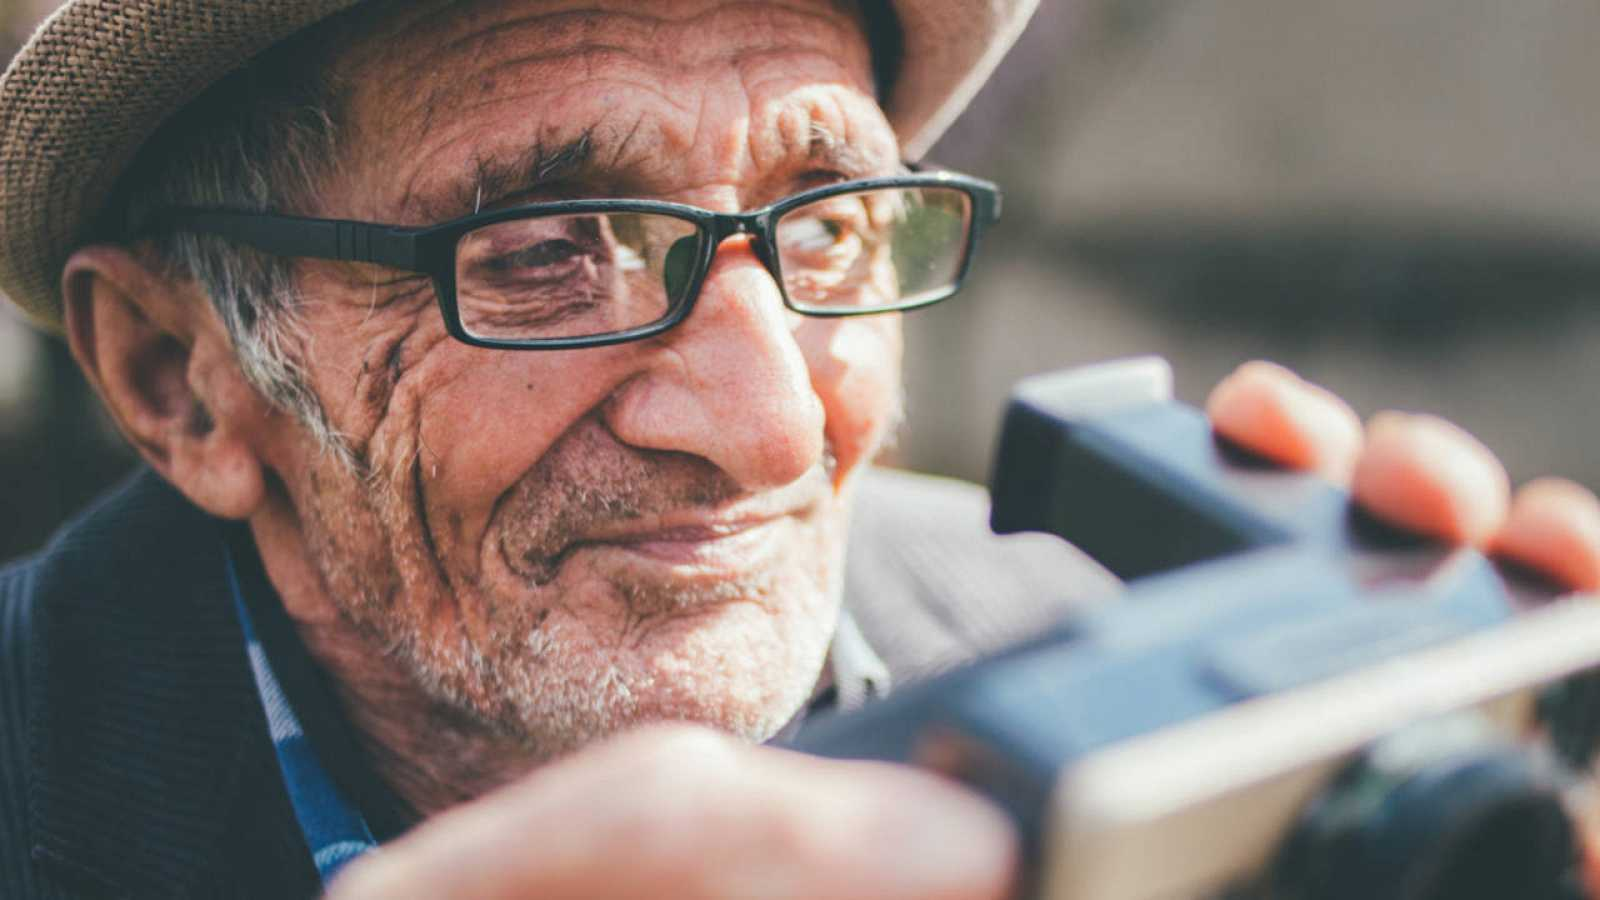 Retrato de un fogógrafo maduro sosteniendo su cámara Polaroid.